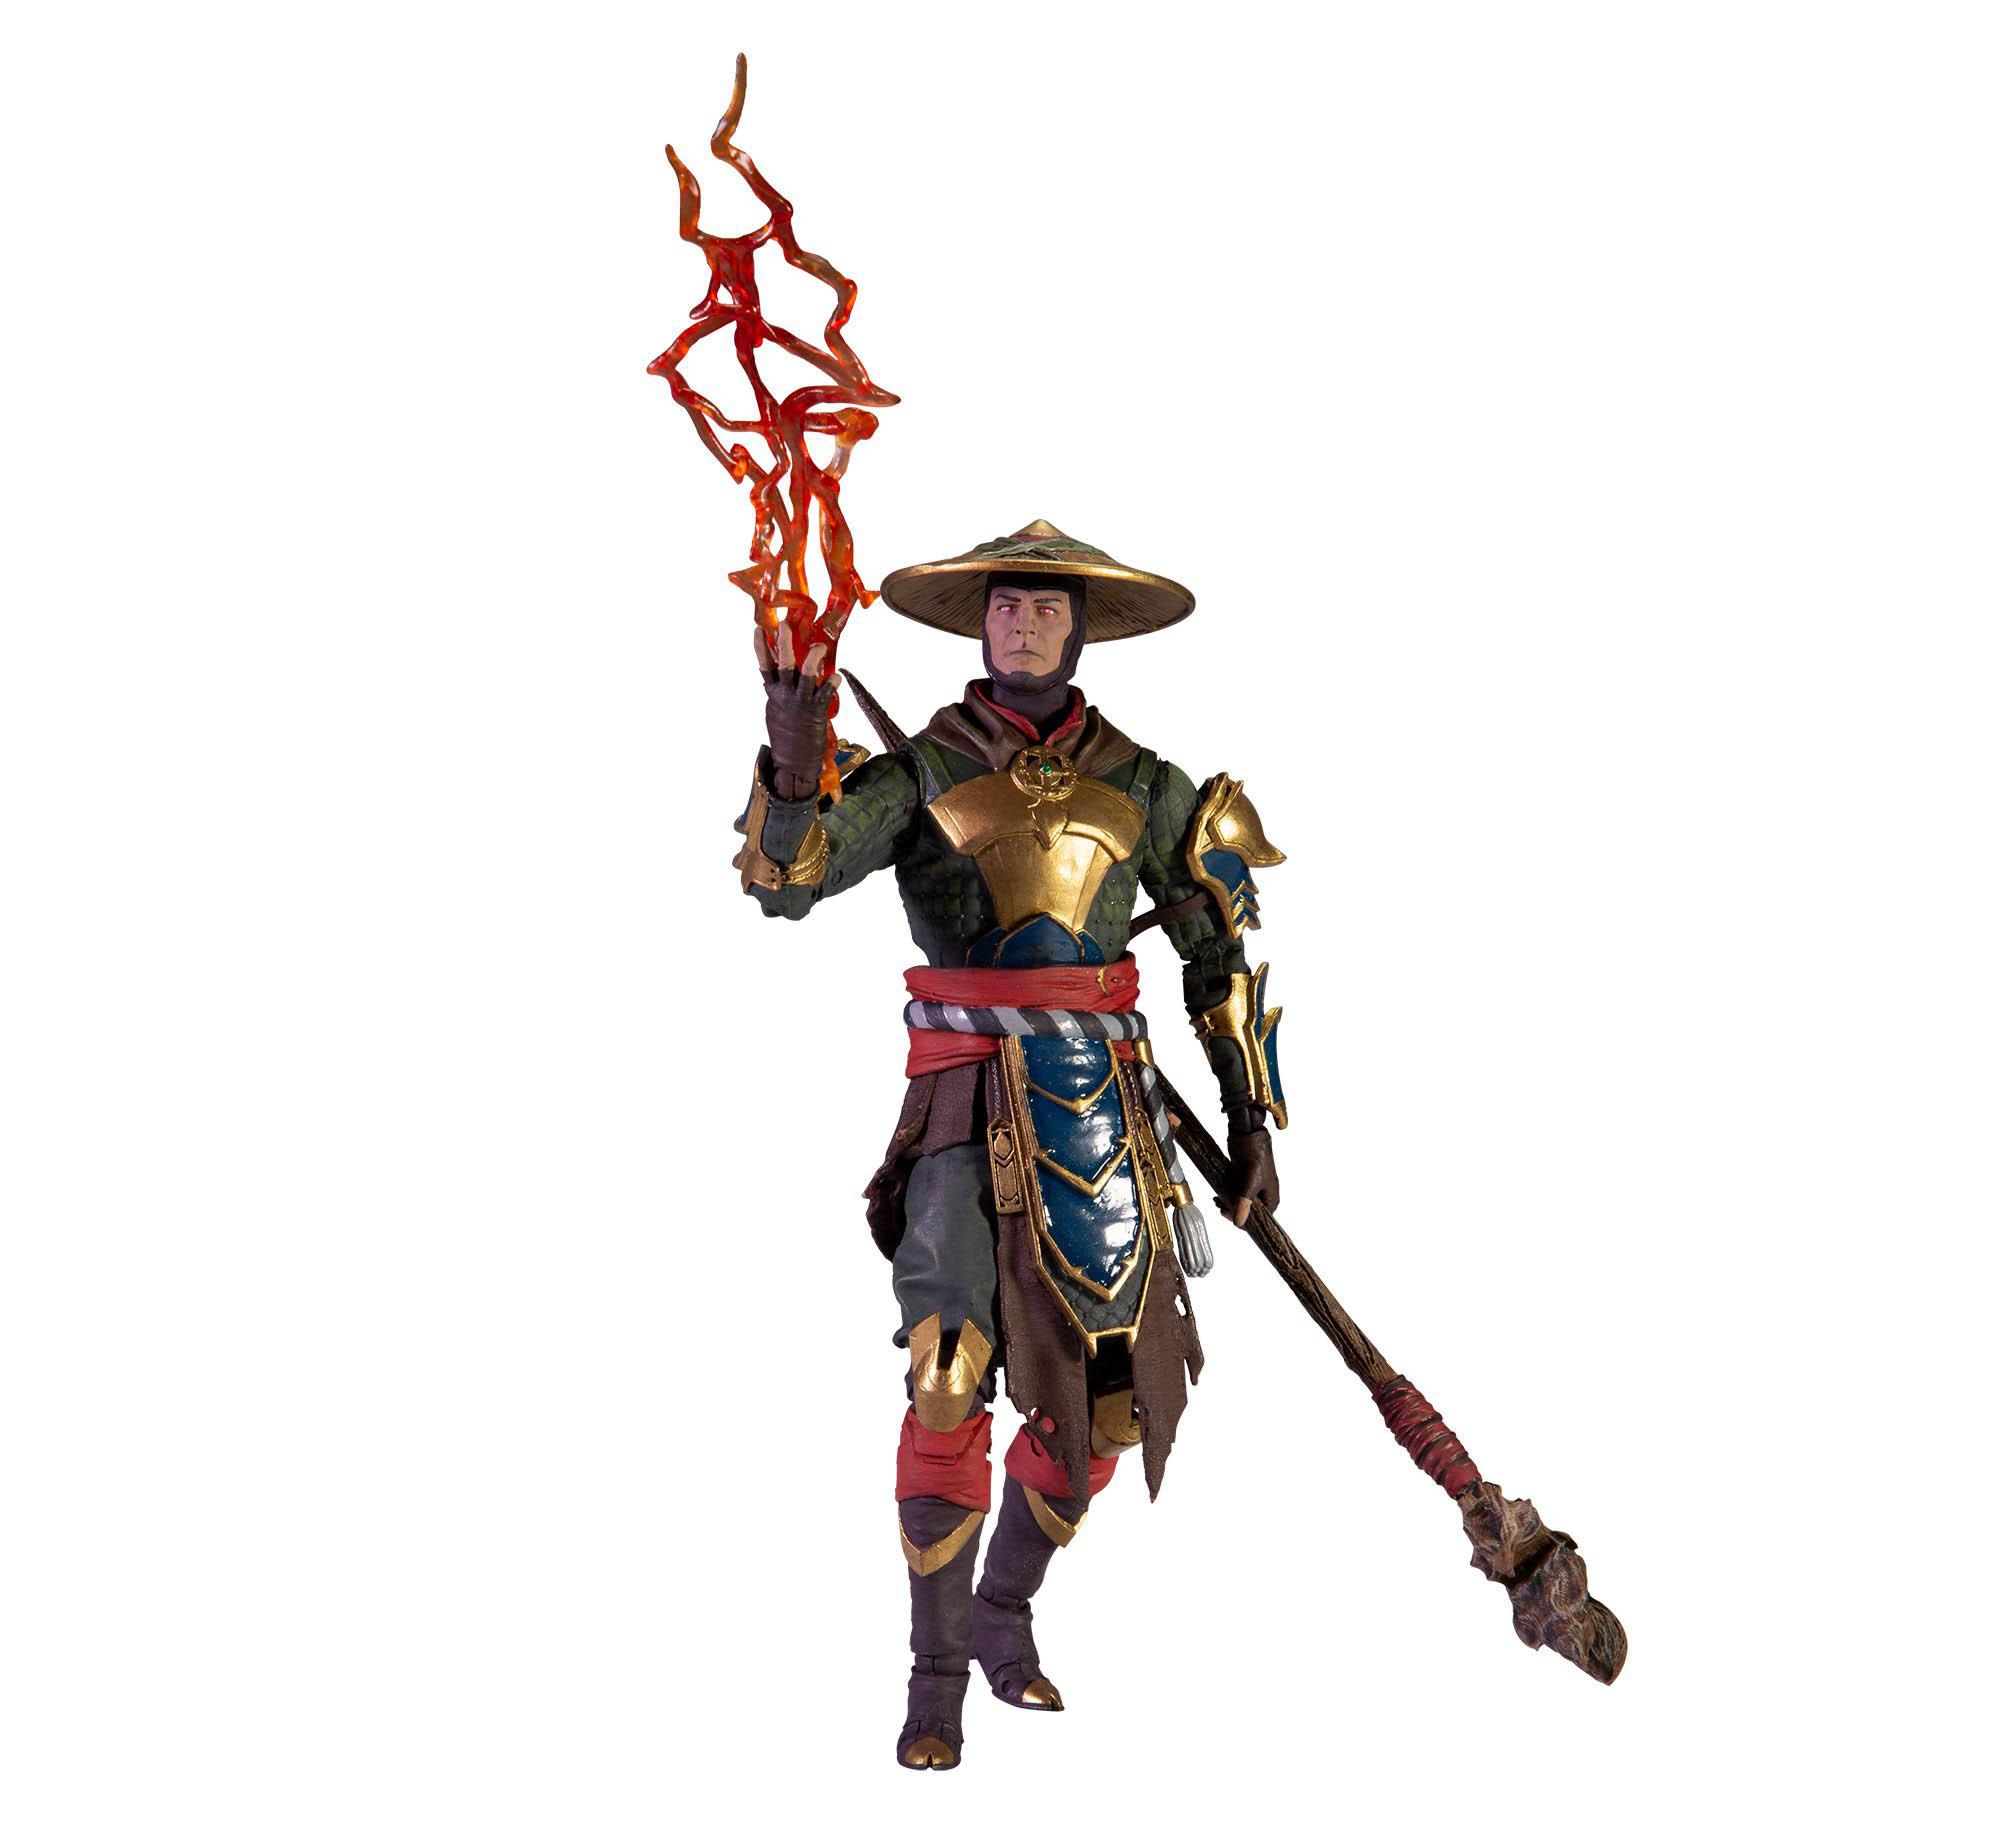 Raiden - McFarlane Mortal Kombat 11 Action Figure